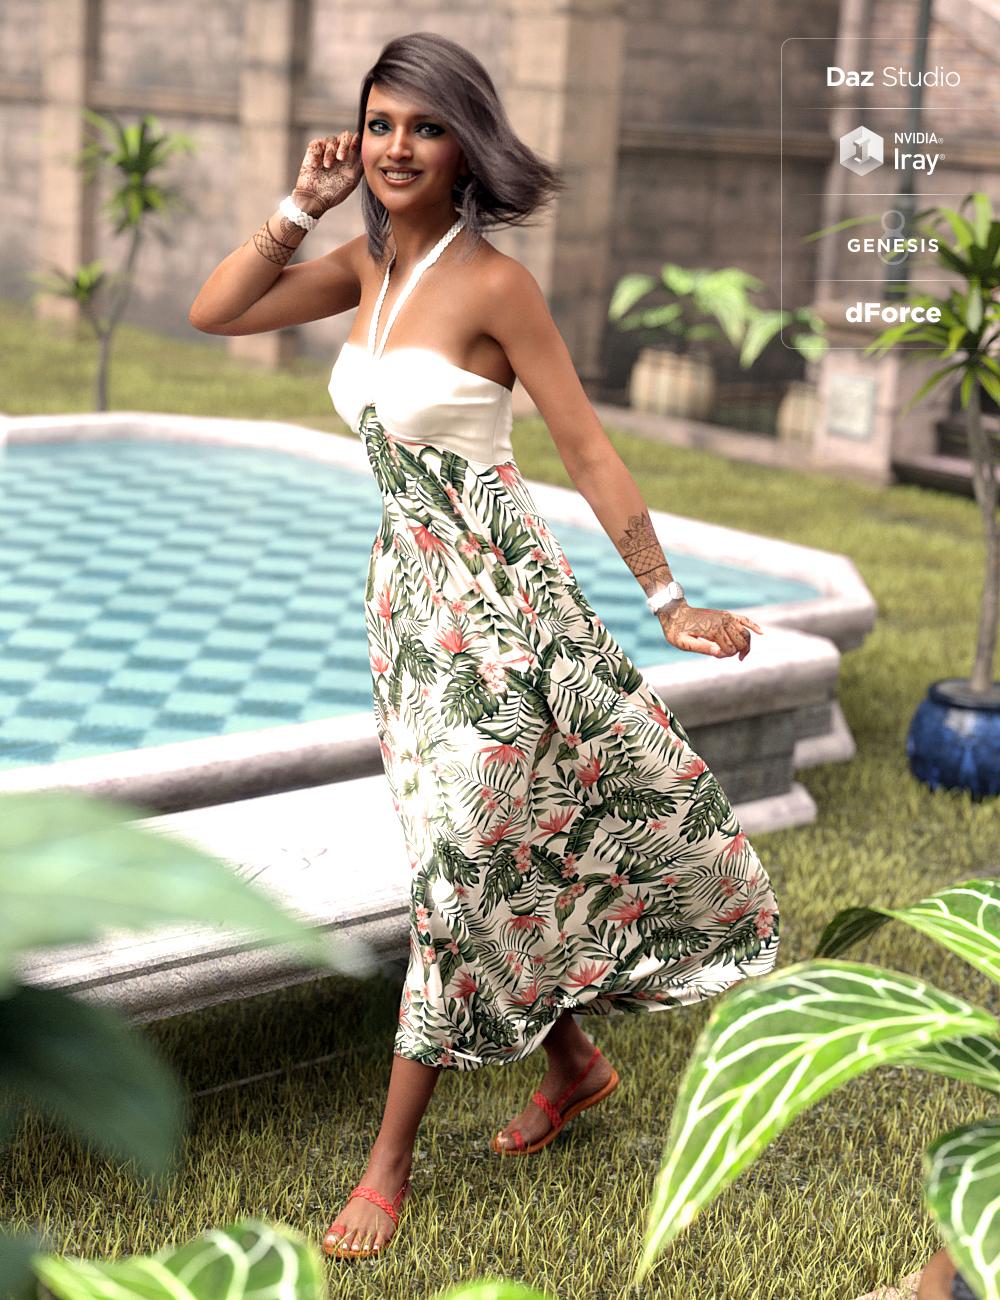 dForce Tropical Breeze Outfit for Genesis 8 Female(s) by: Moonscape GraphicsNikisatezSade, 3D Models by Daz 3D